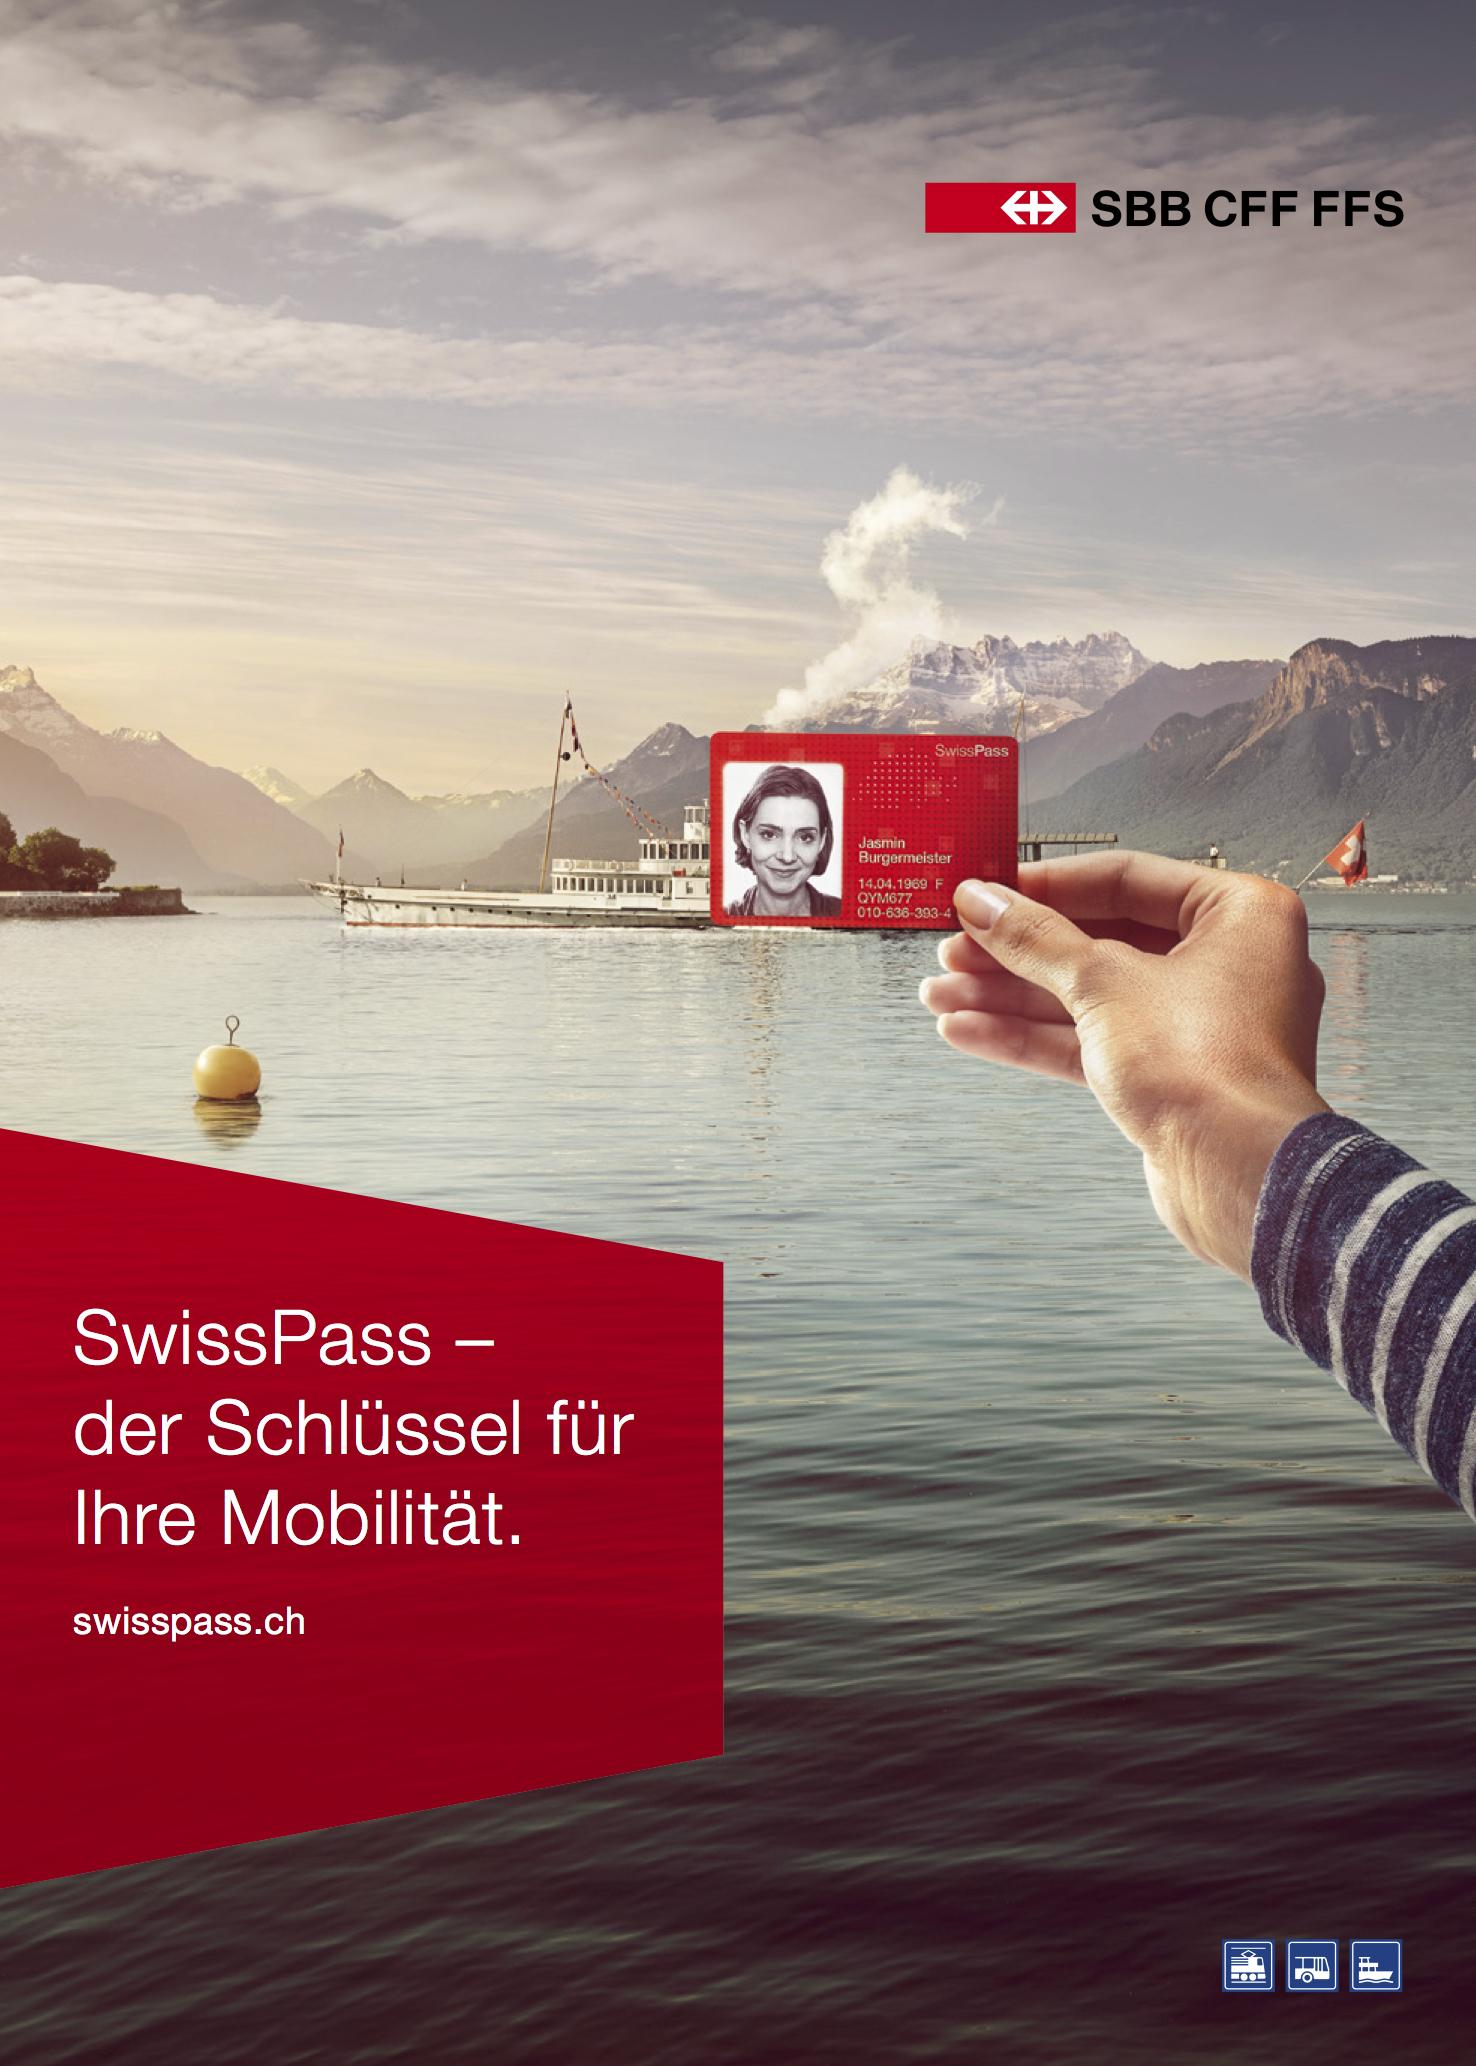 SBB – SwissPass